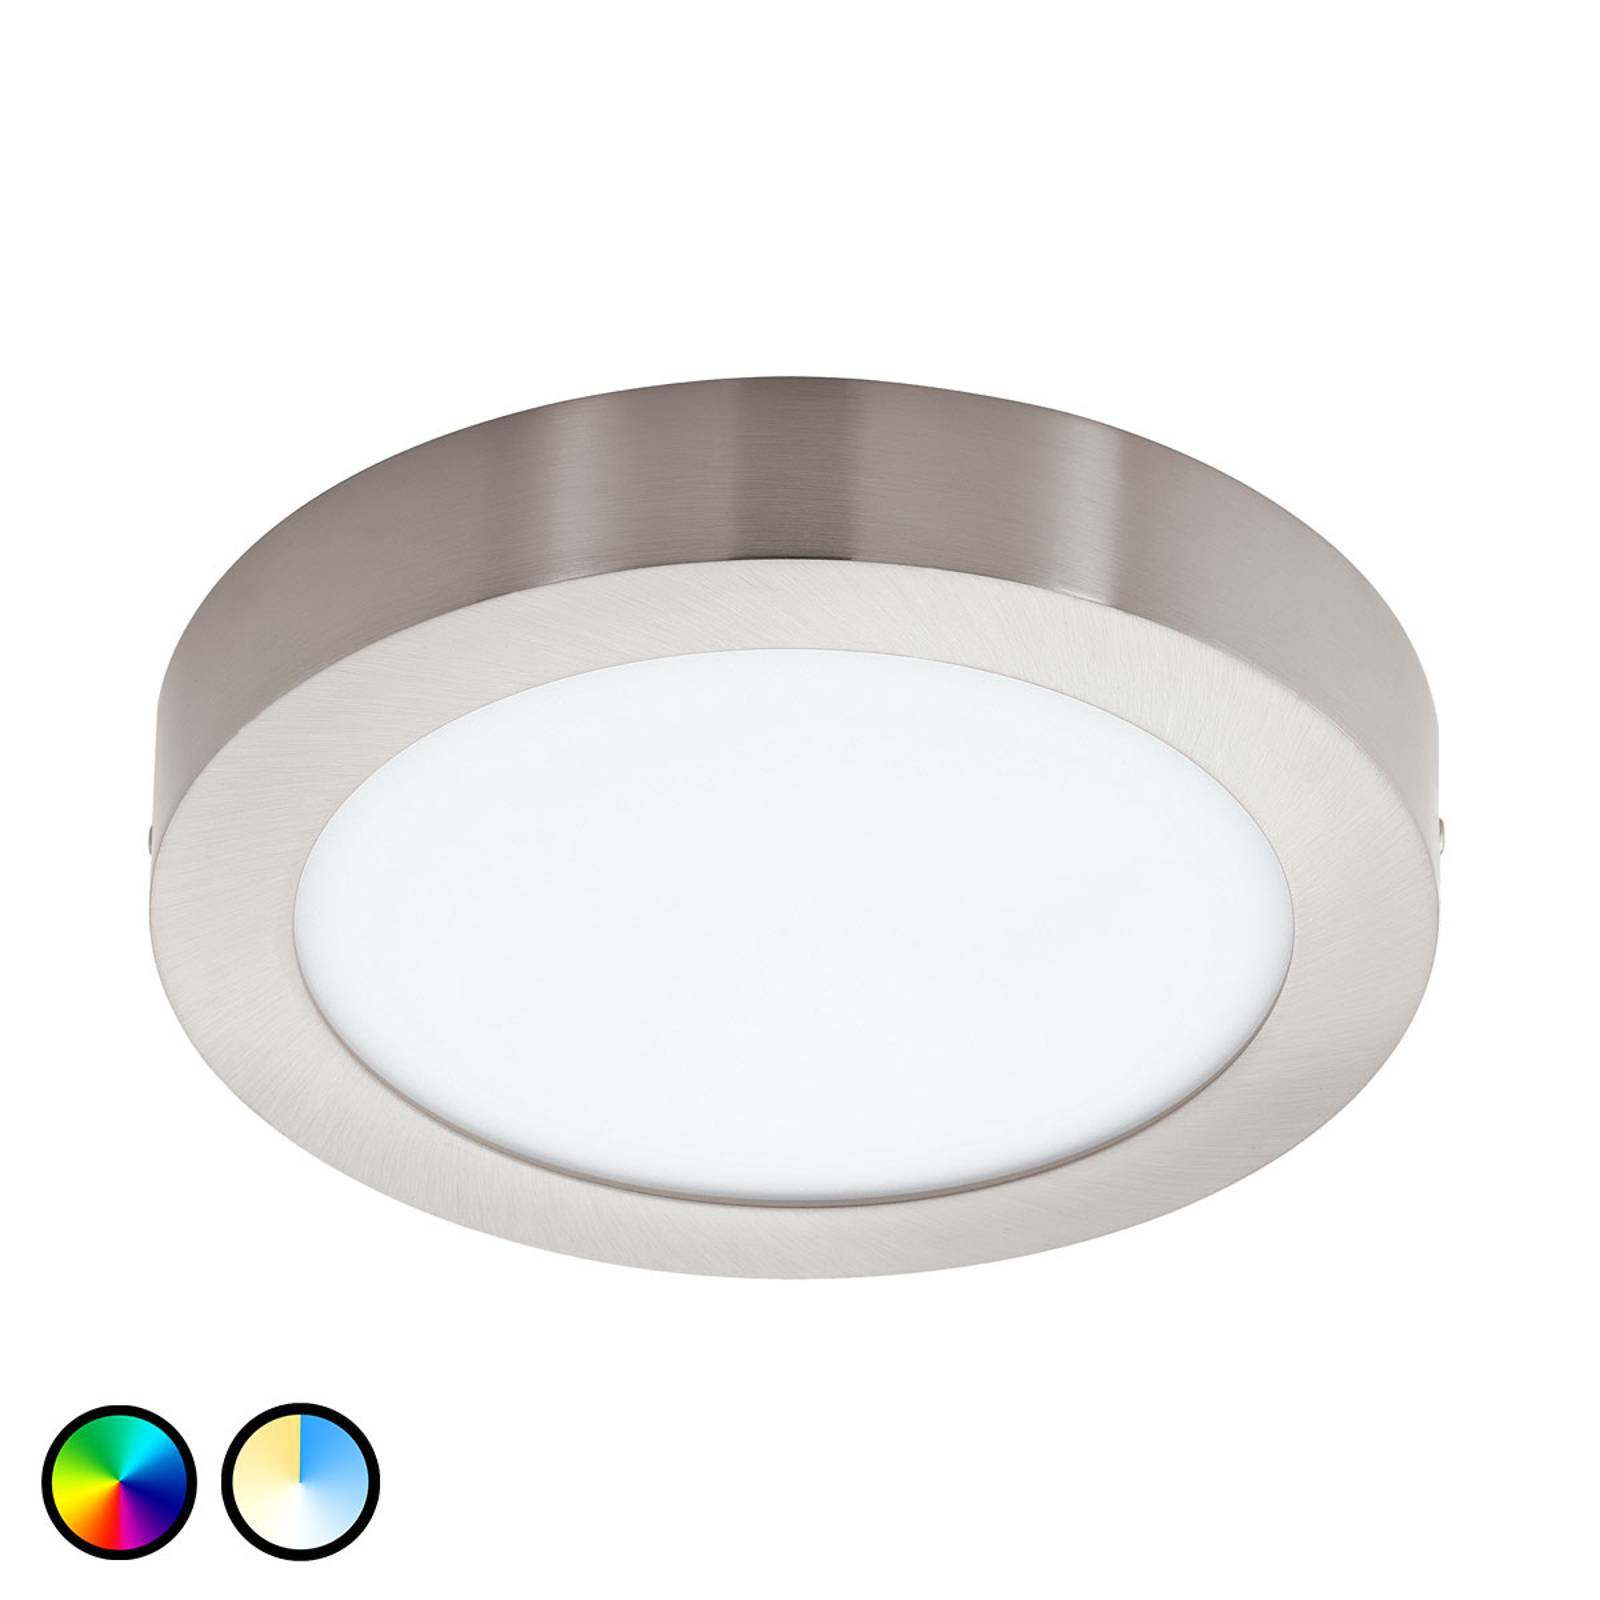 EGLO Connect Fueva-C taklampe rund 22,5 cm nikkel